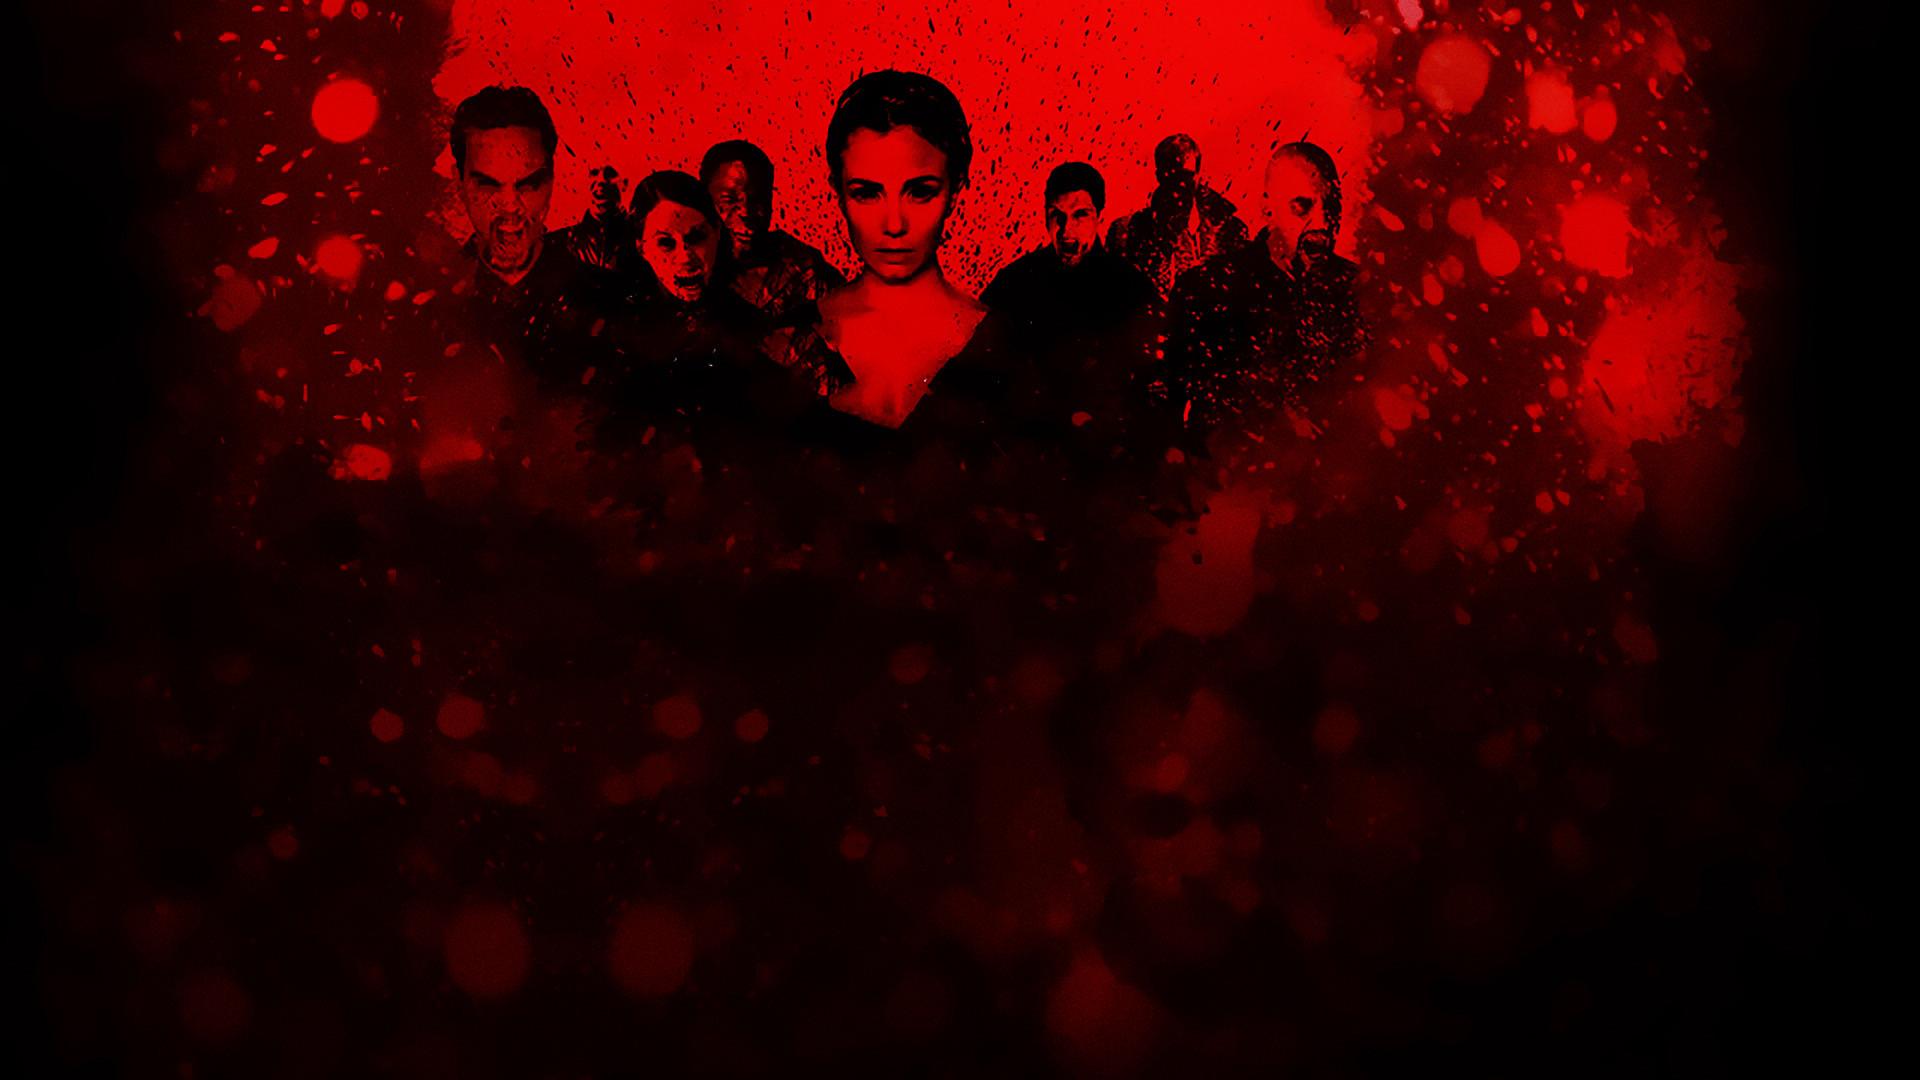 30 Days of Night: Dark Days | Movie fanart | fanart.tv